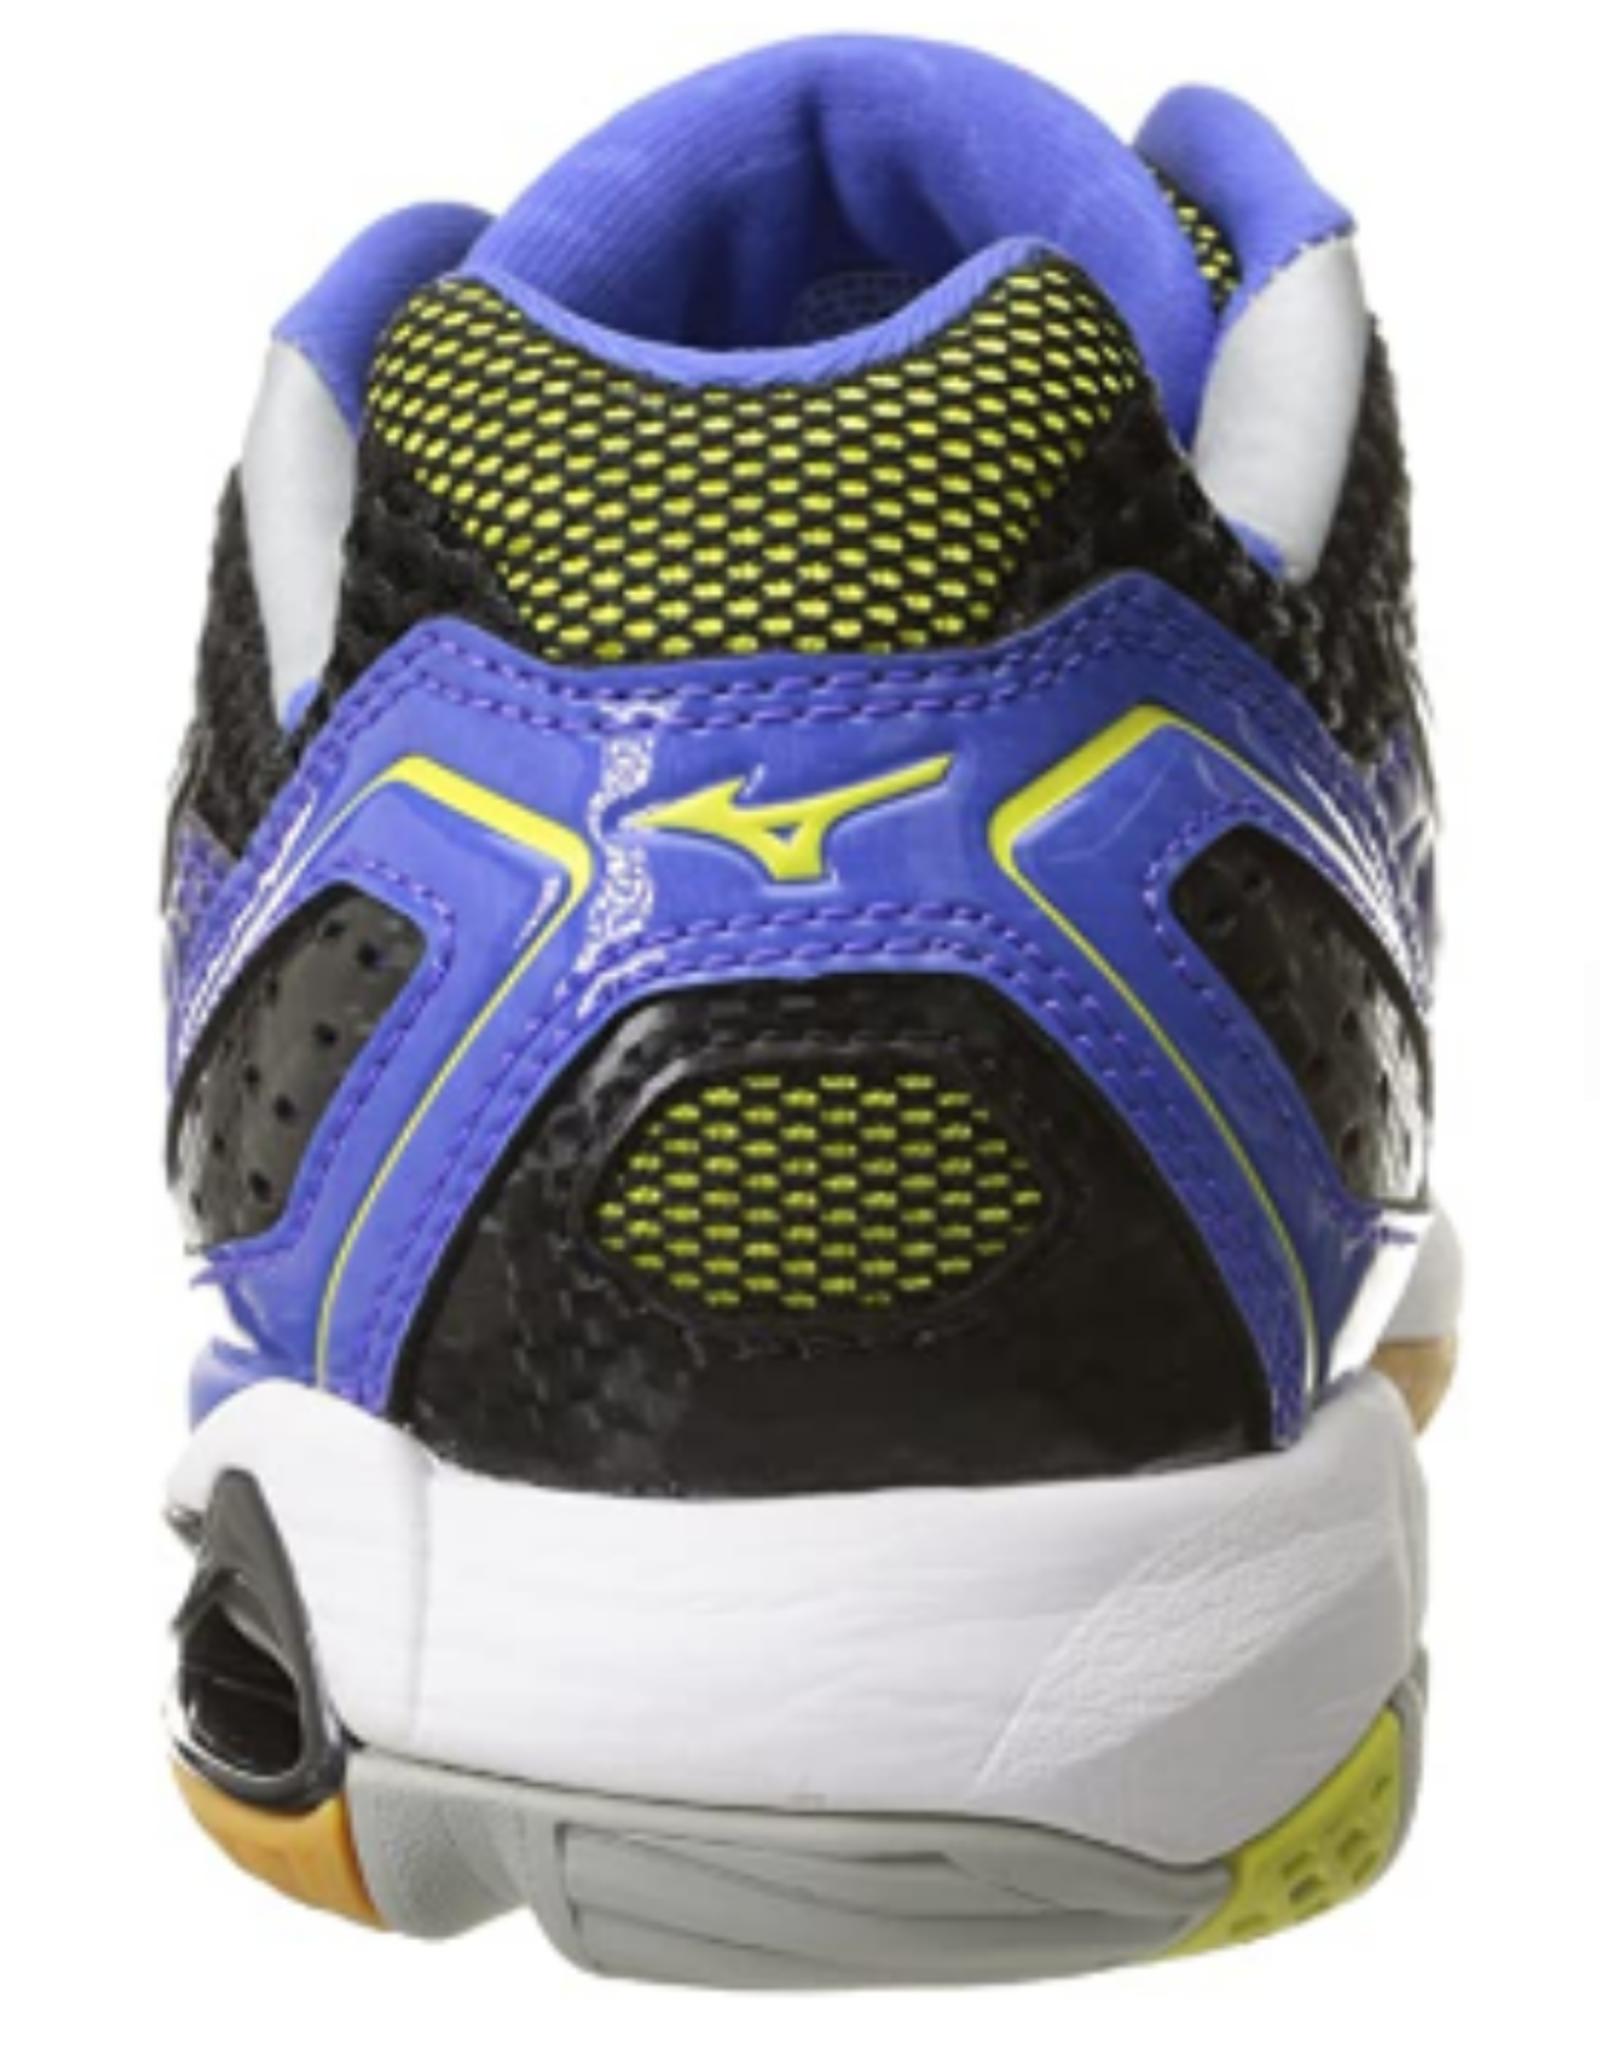 Mizuno Men's Wave Tornado 9 Blue/Yellow